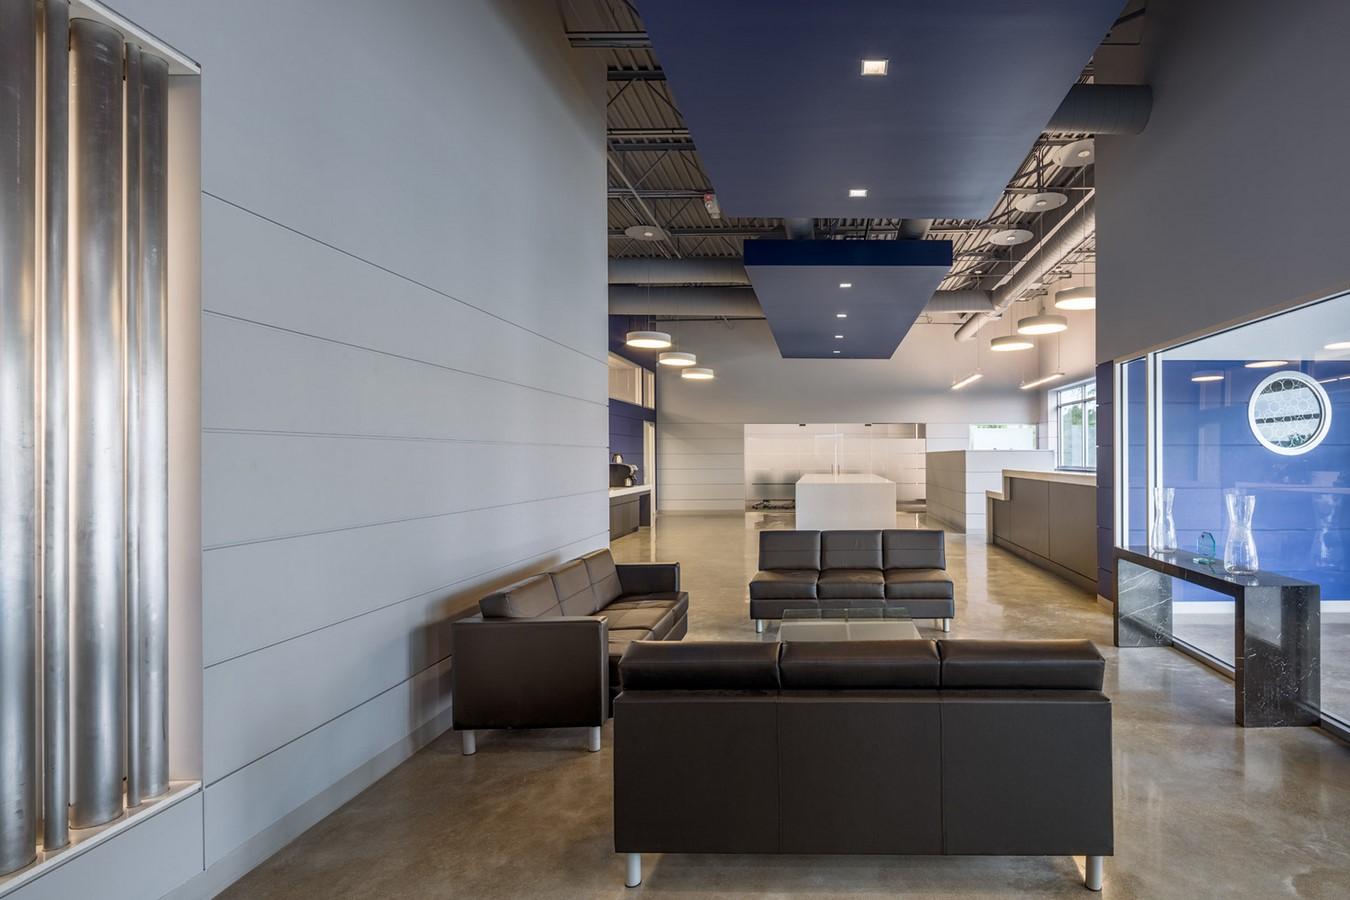 Walker engineering corporate headquarters, Houston, Texas -Sheet2